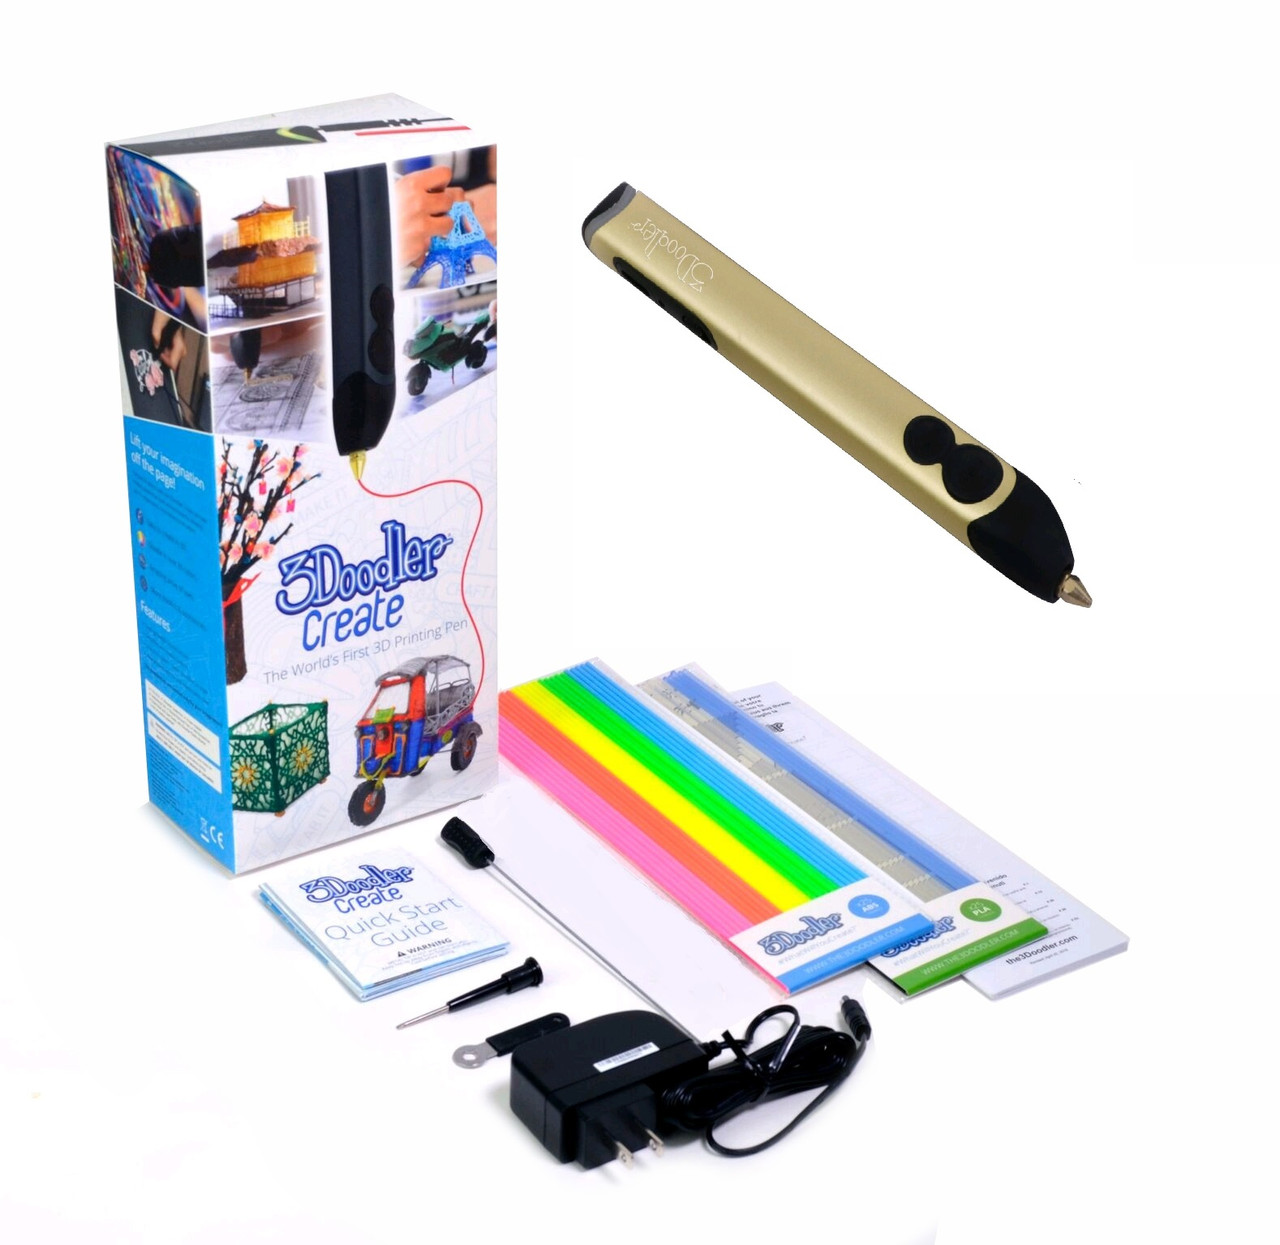 3D-ручка 3Doodler Create Золотая 3DOOD-CRE-BUTTER-EU, фото 1